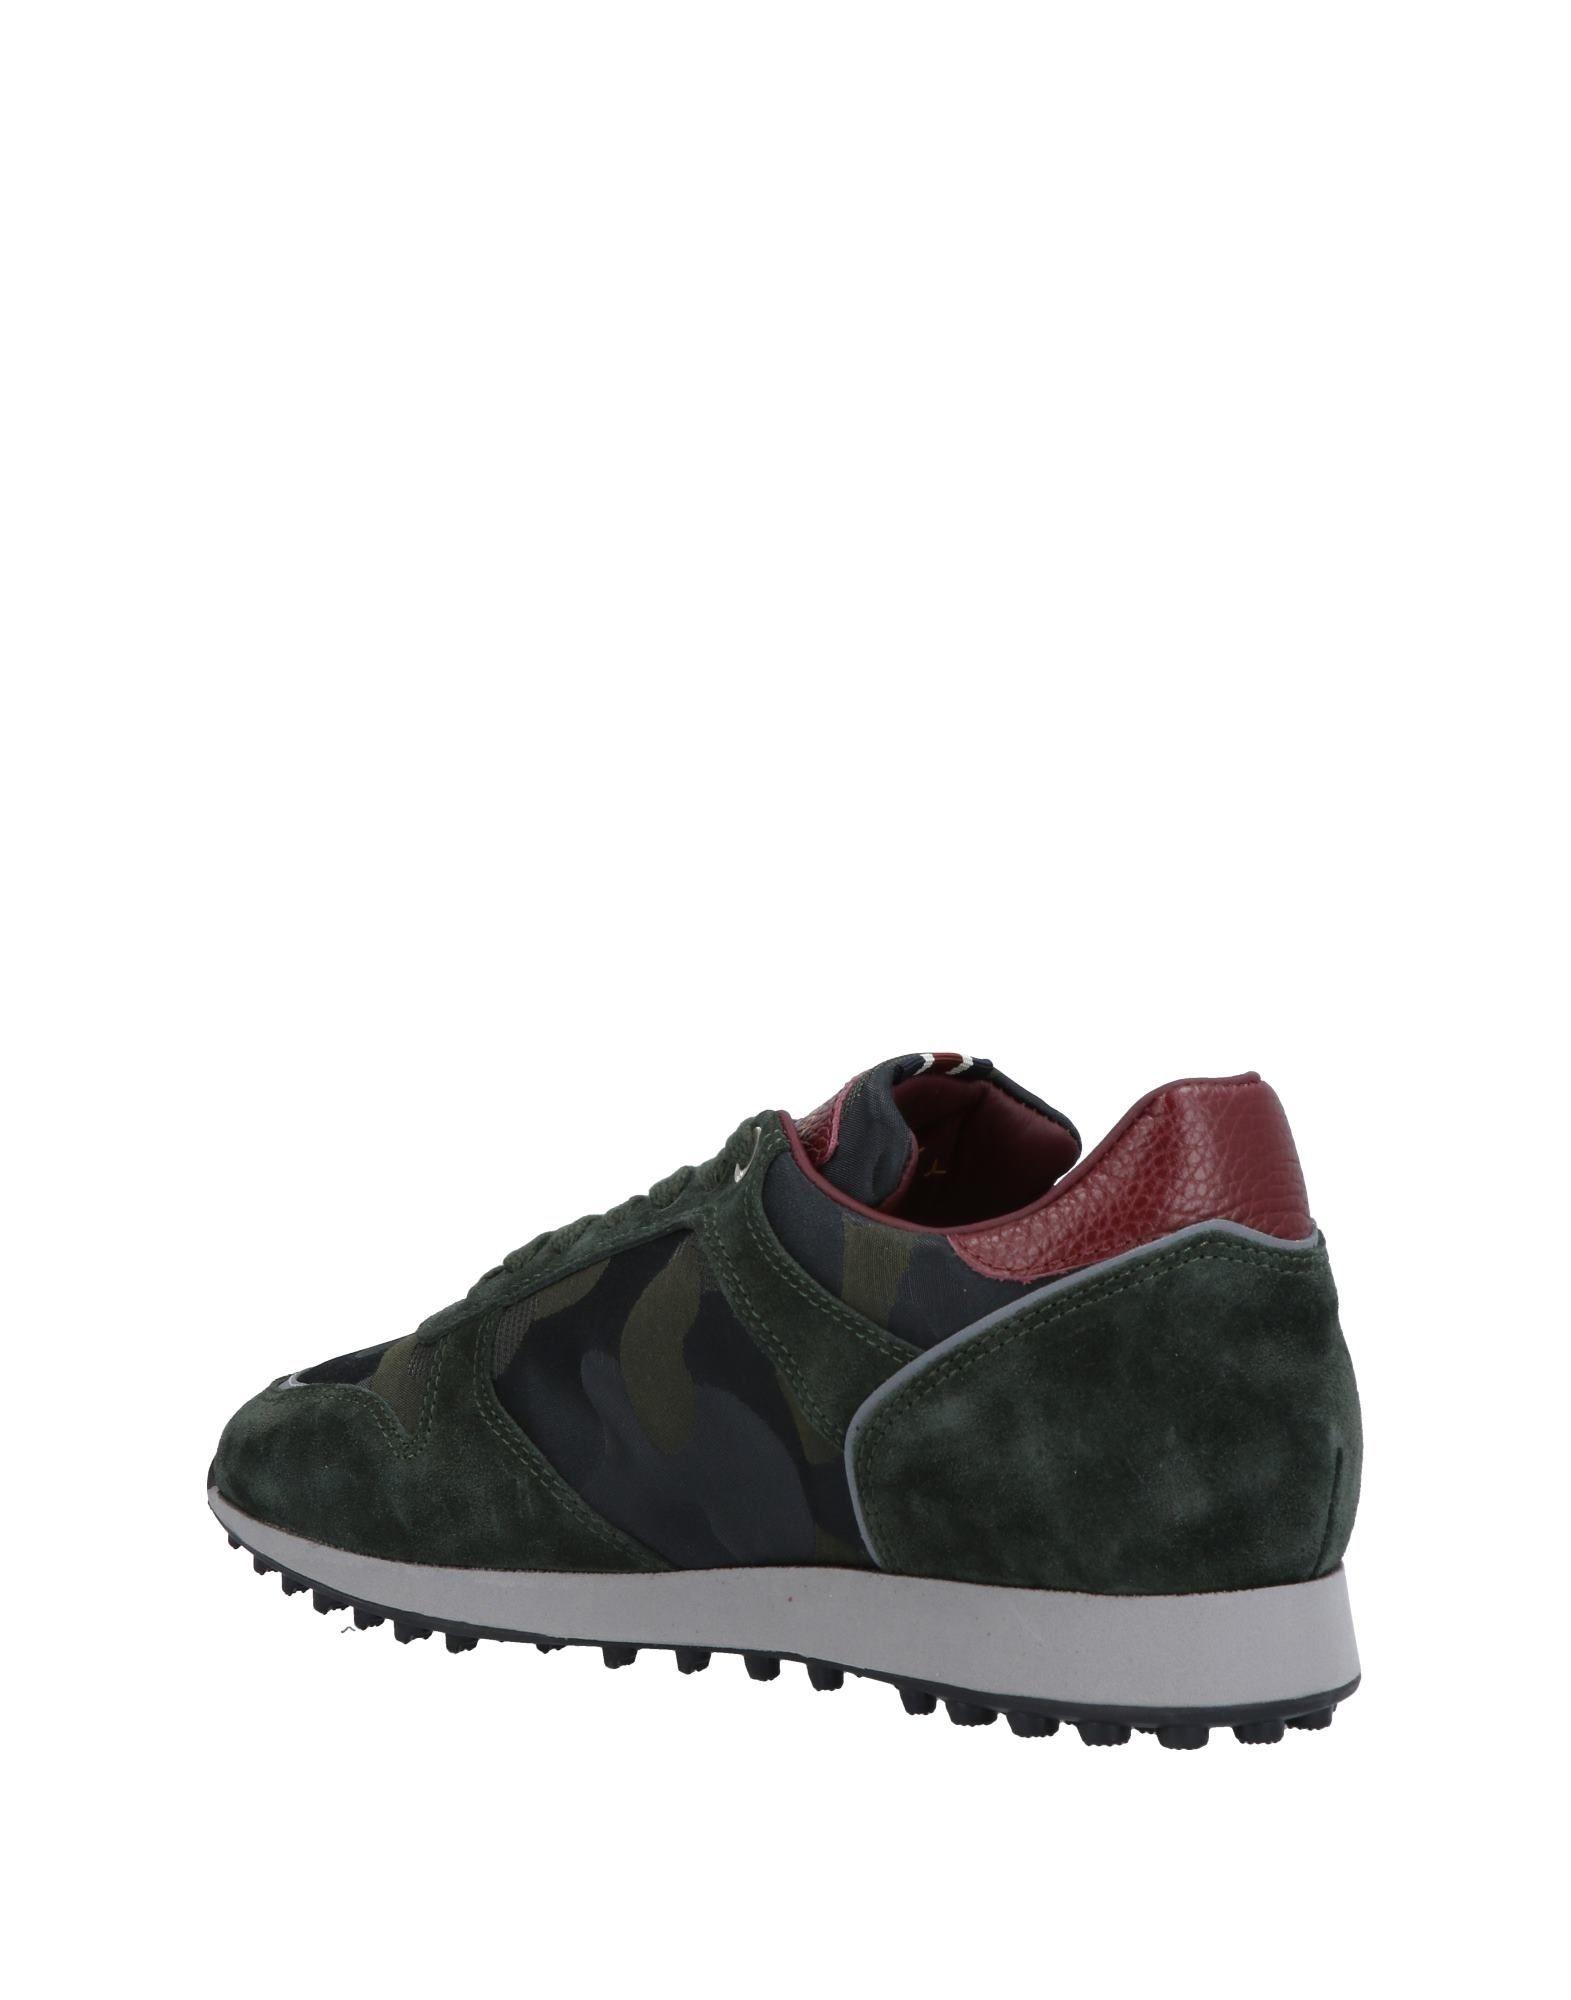 Rabatt Herren echte Schuhe D'Acquasparta Sneakers Herren Rabatt  11467542CJ 10c7e2